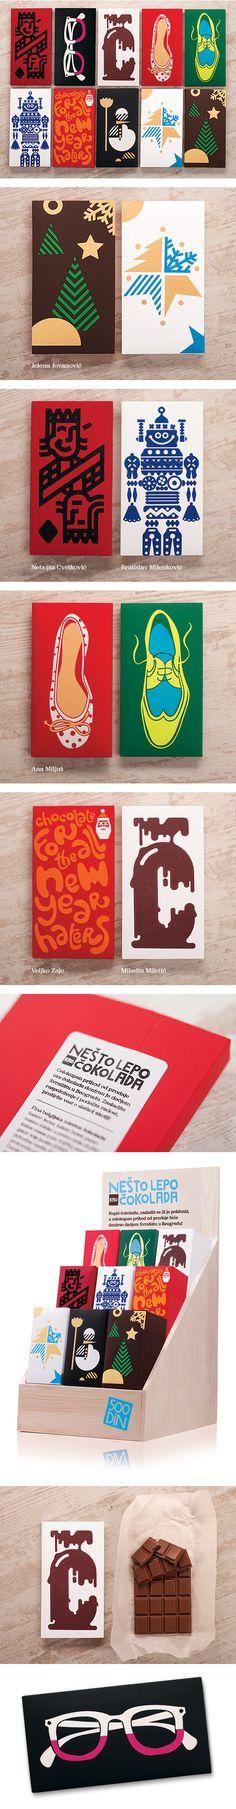 Nešto lepo kao čokolada #chocolate #packaging by Veljko Zajc